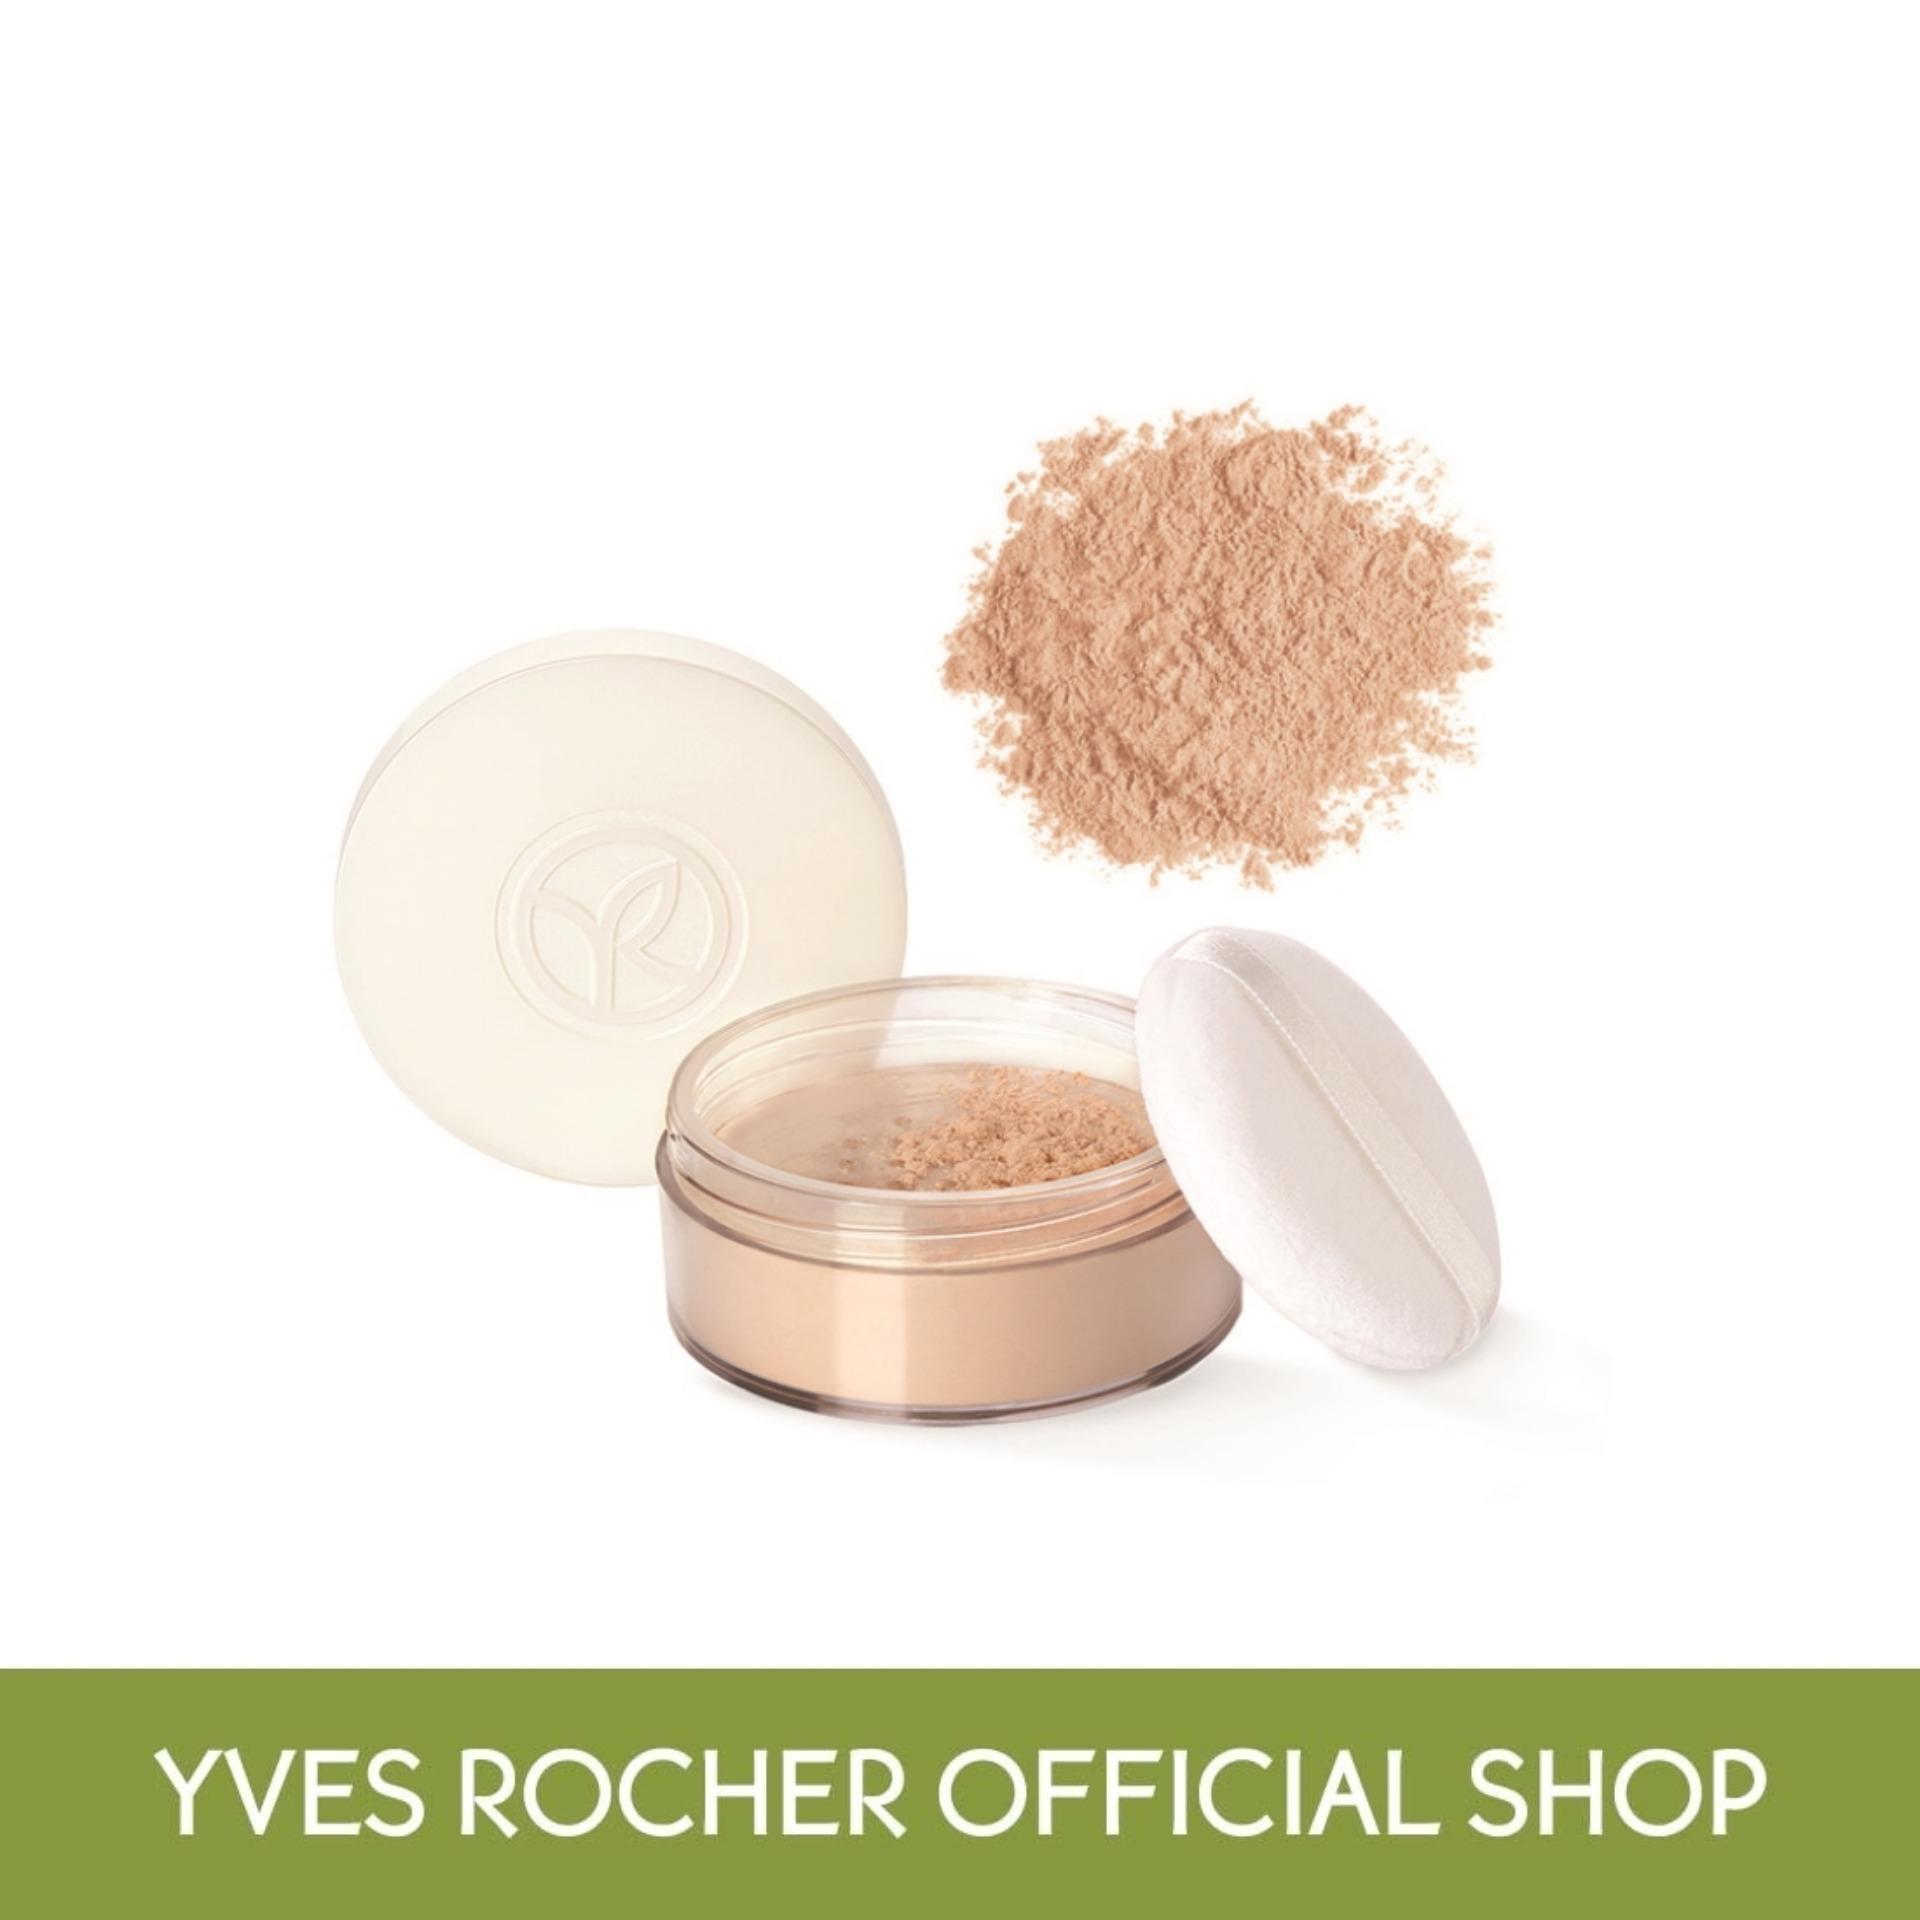 Yves Rocher Pure Light & Luminous Loose Powder Beige 15g (tf) By Yves Rocher Singapore (capitaland Merchant).